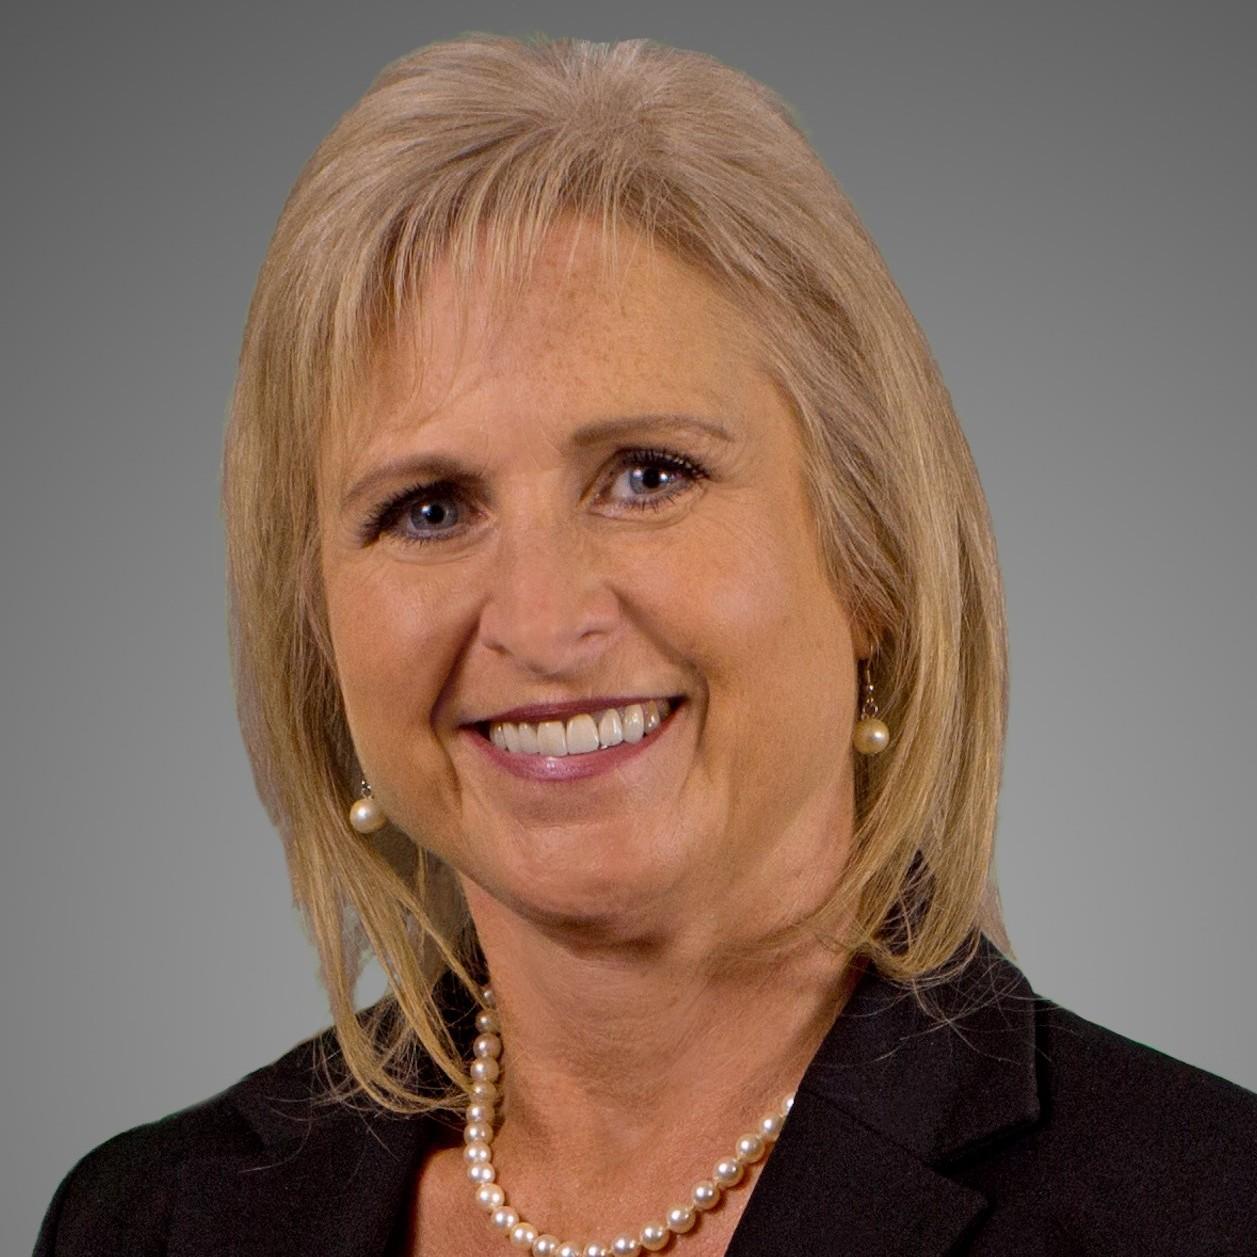 Suzanne Neuberger